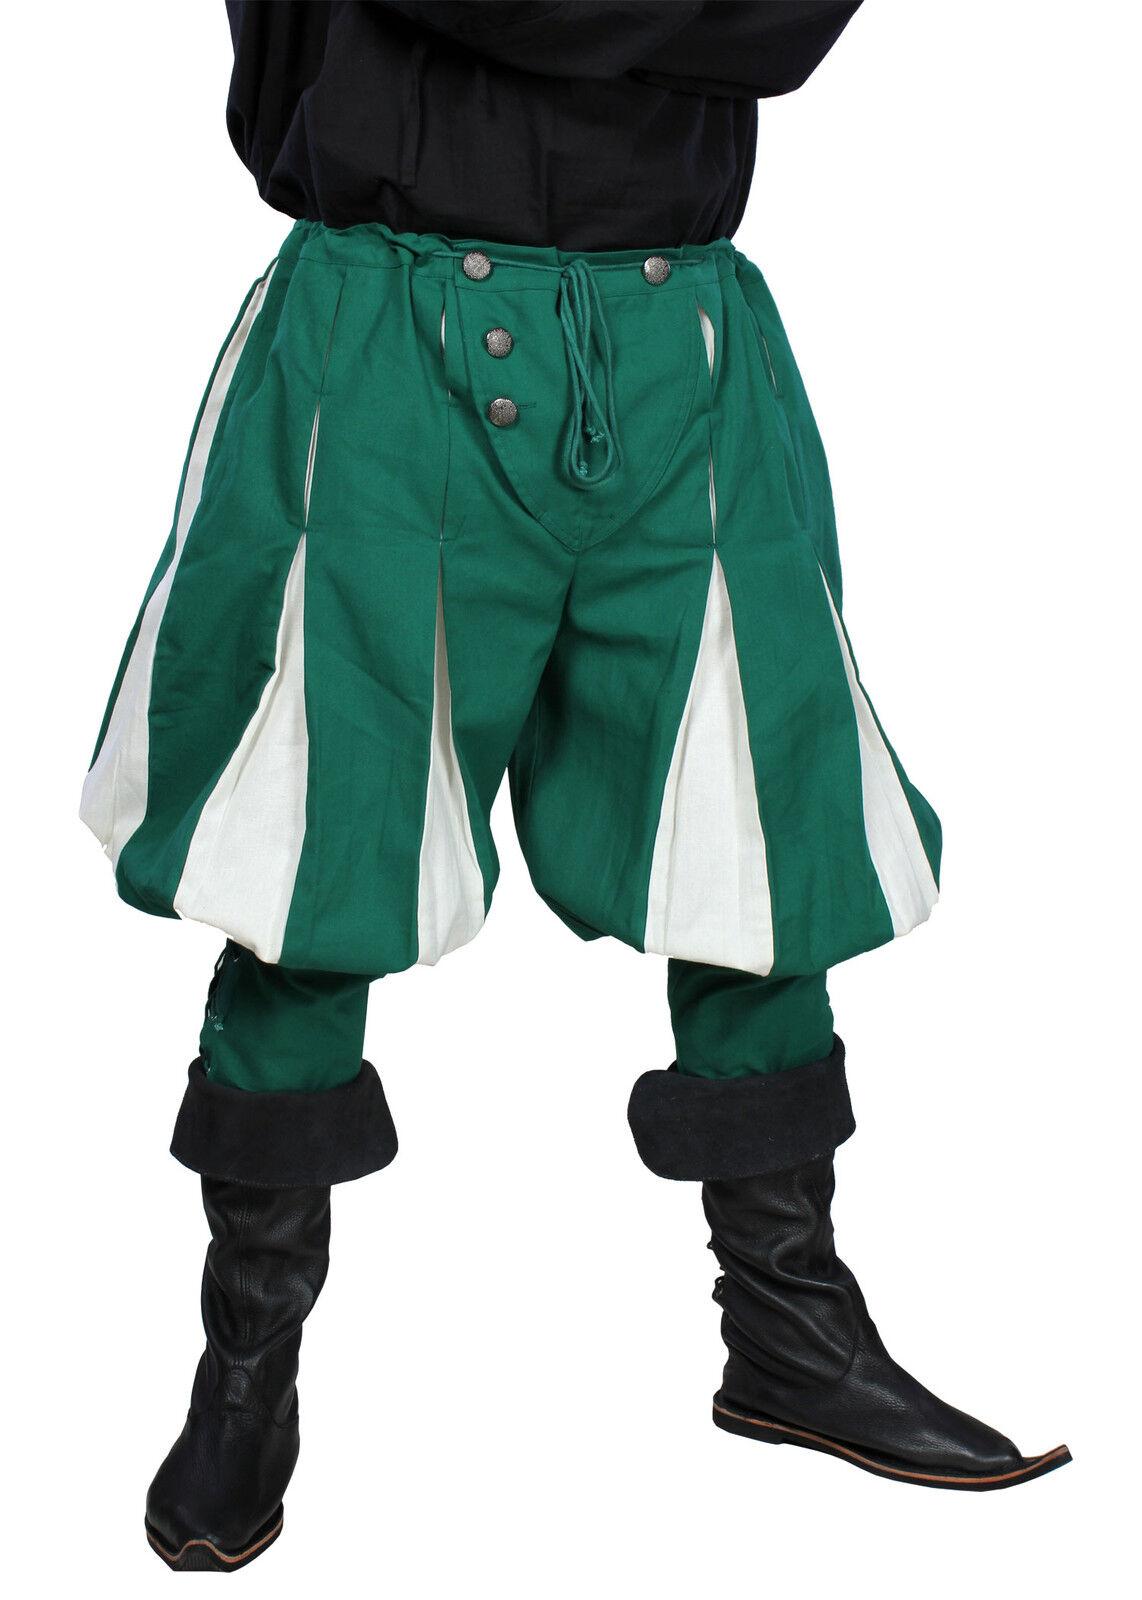 Landsquenet Pants, green/white, Medieval LARP Trousers Costume Garment